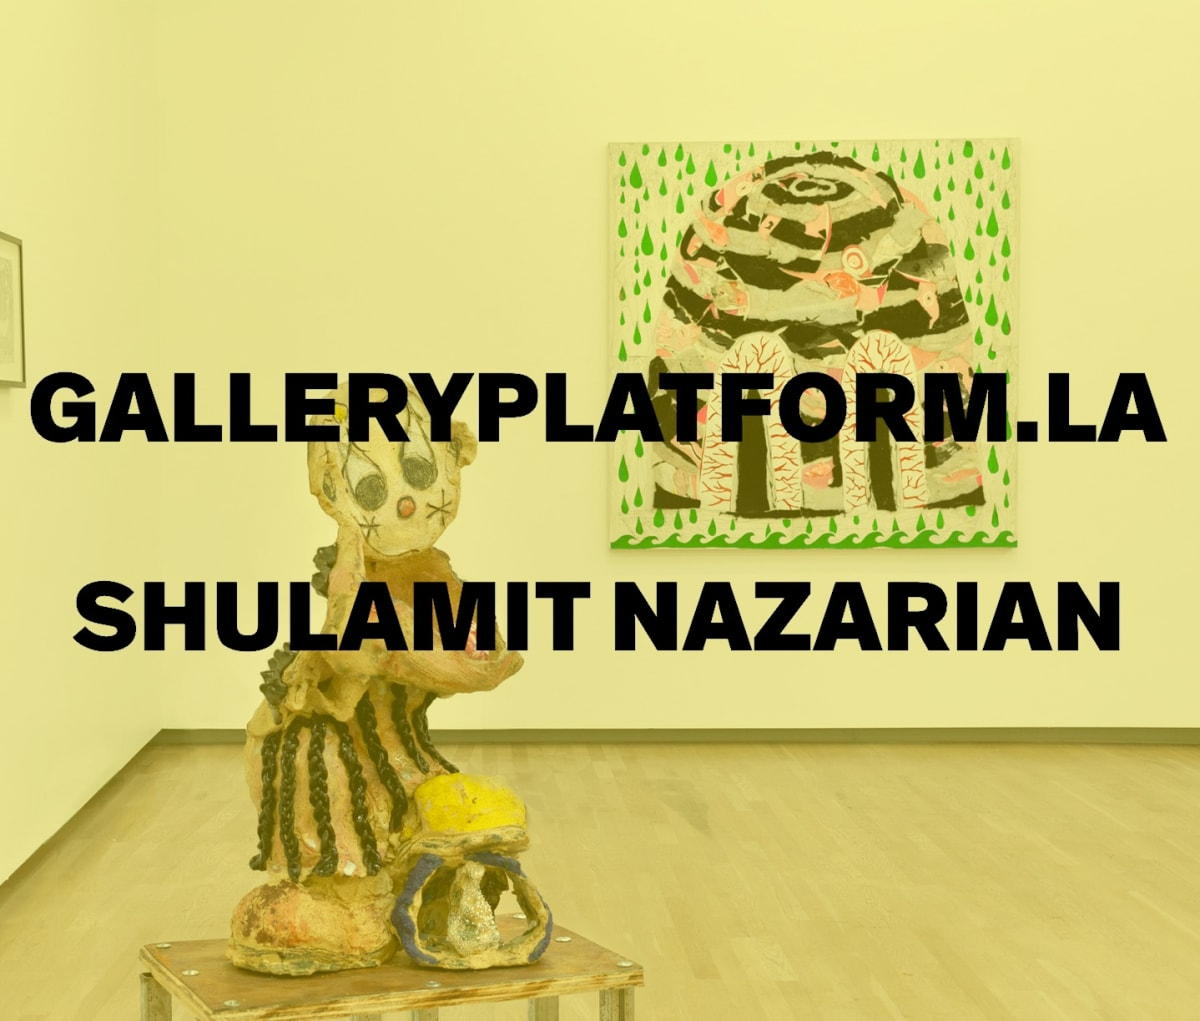 Week One: Shulamit Nazarian on Gallery Platform Los Angeles